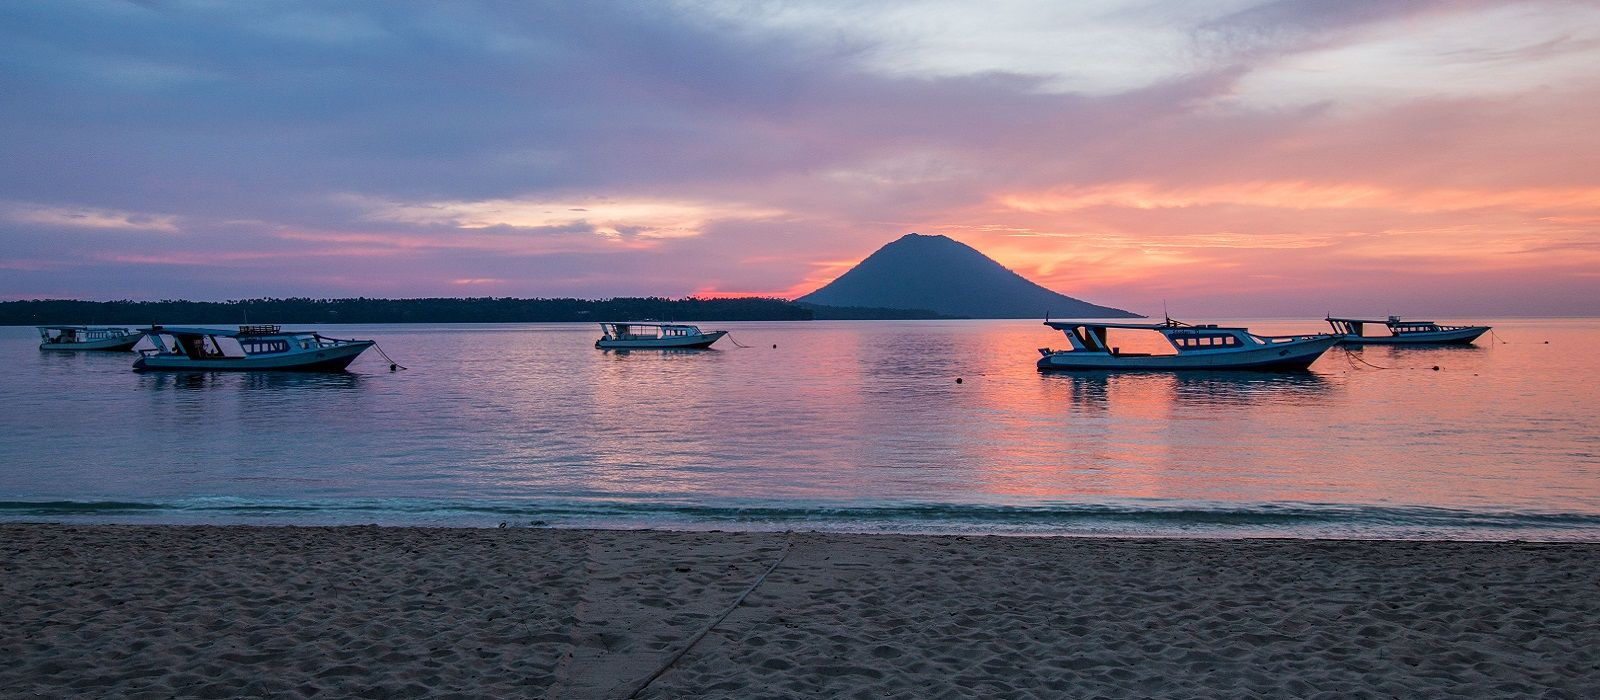 Destination Bunaken National Park Indonesia